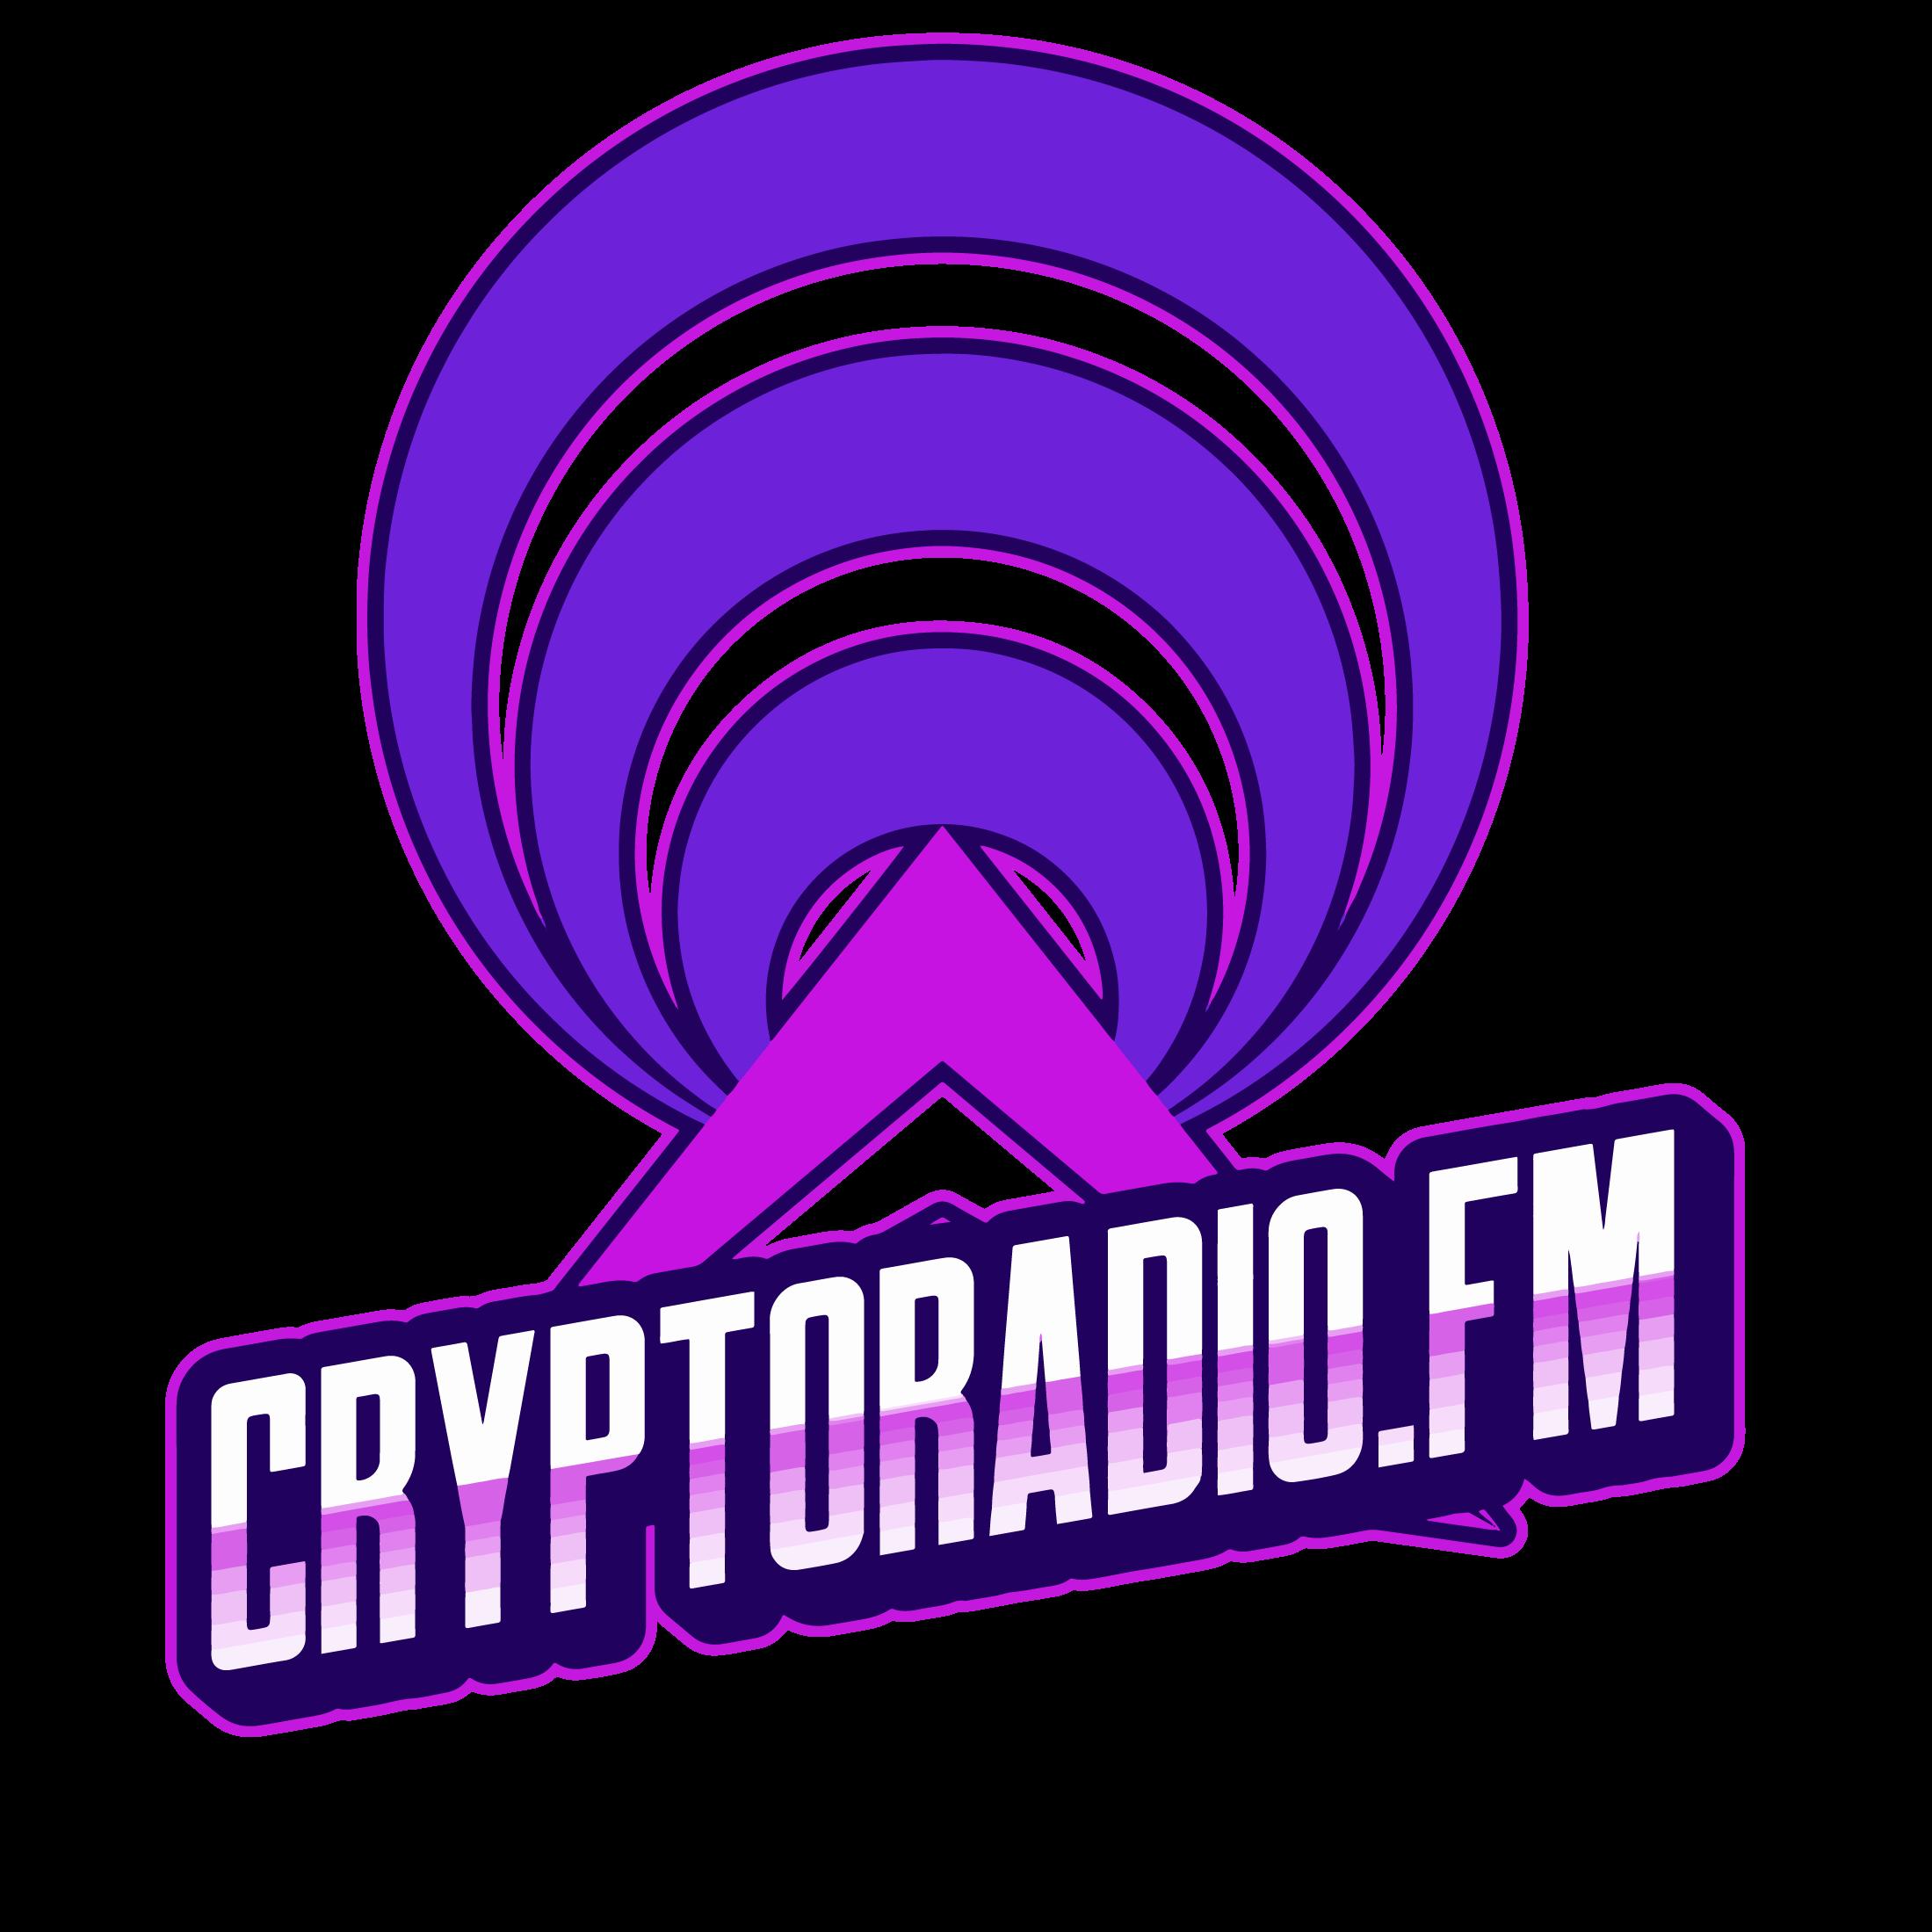 Cryptoradio.FM